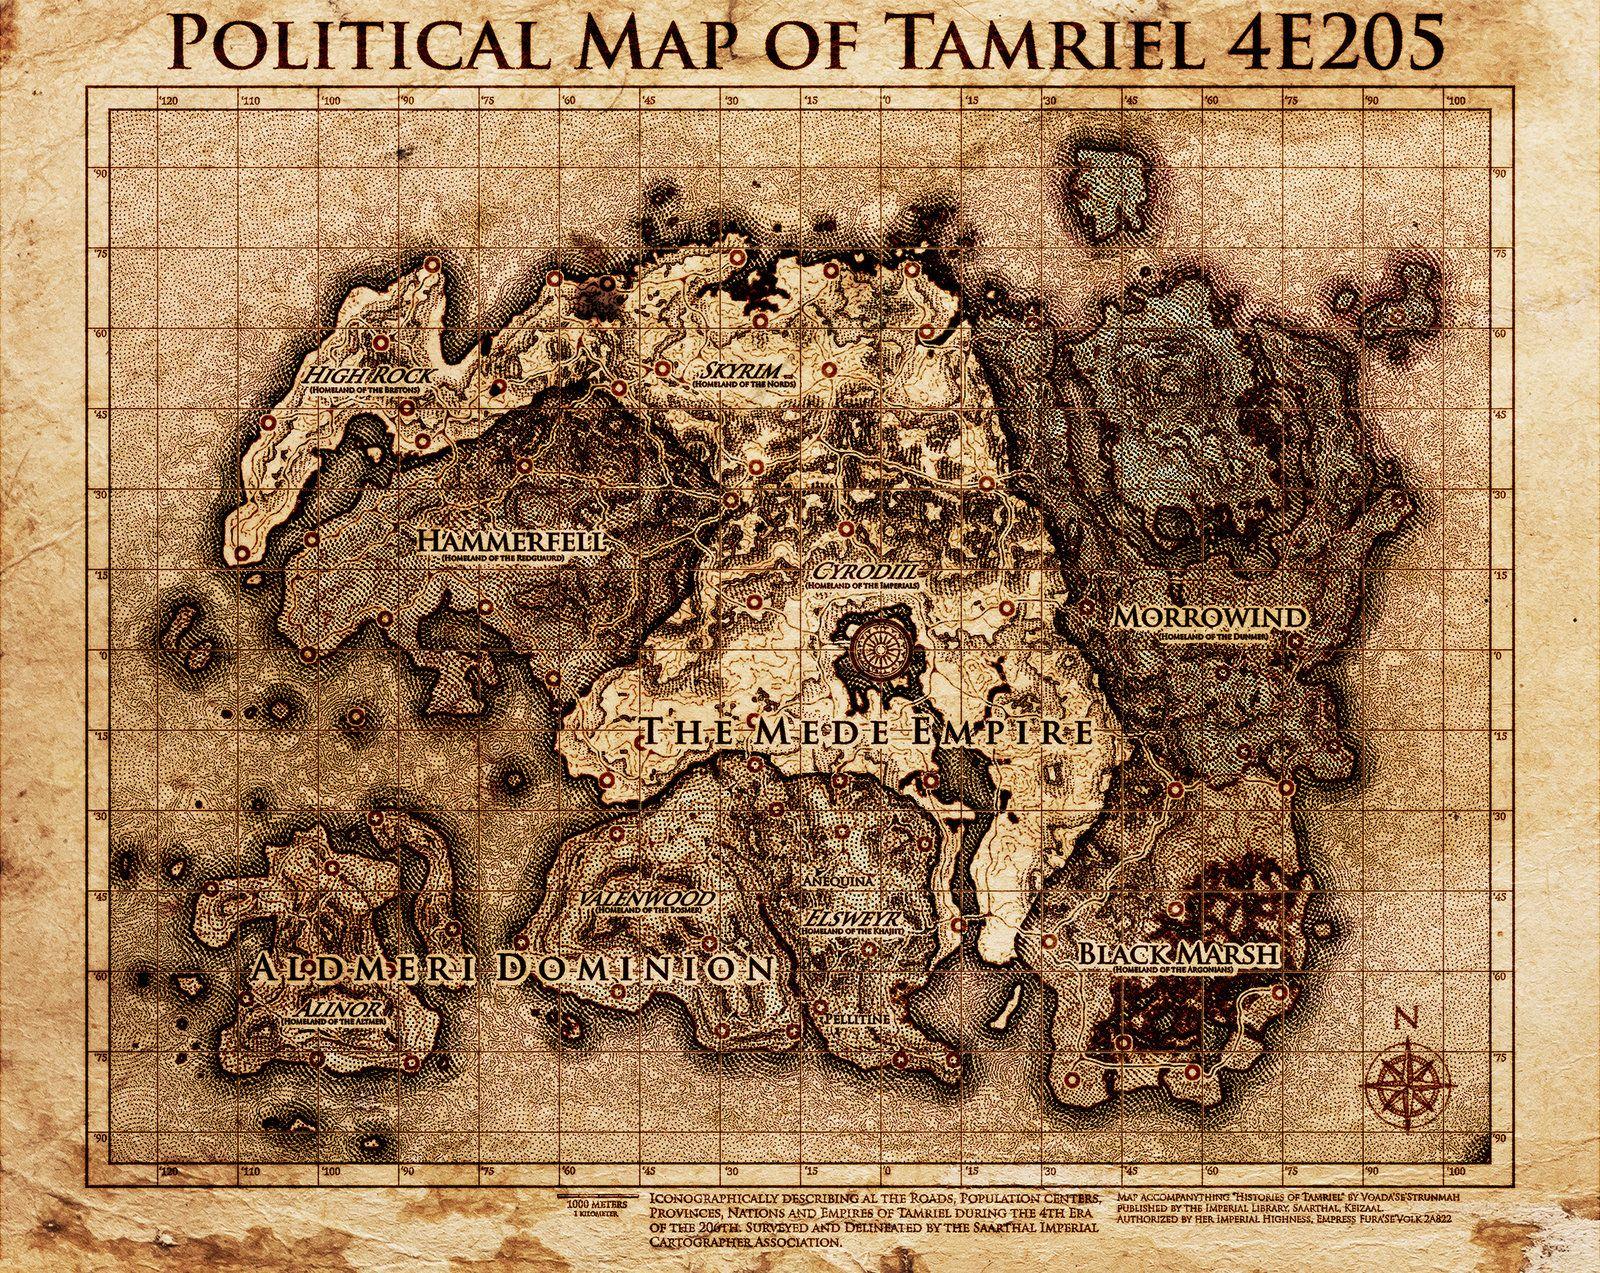 Elder Scrolls Politcial Map Tamriel by DovahFahliil map 1600x1273